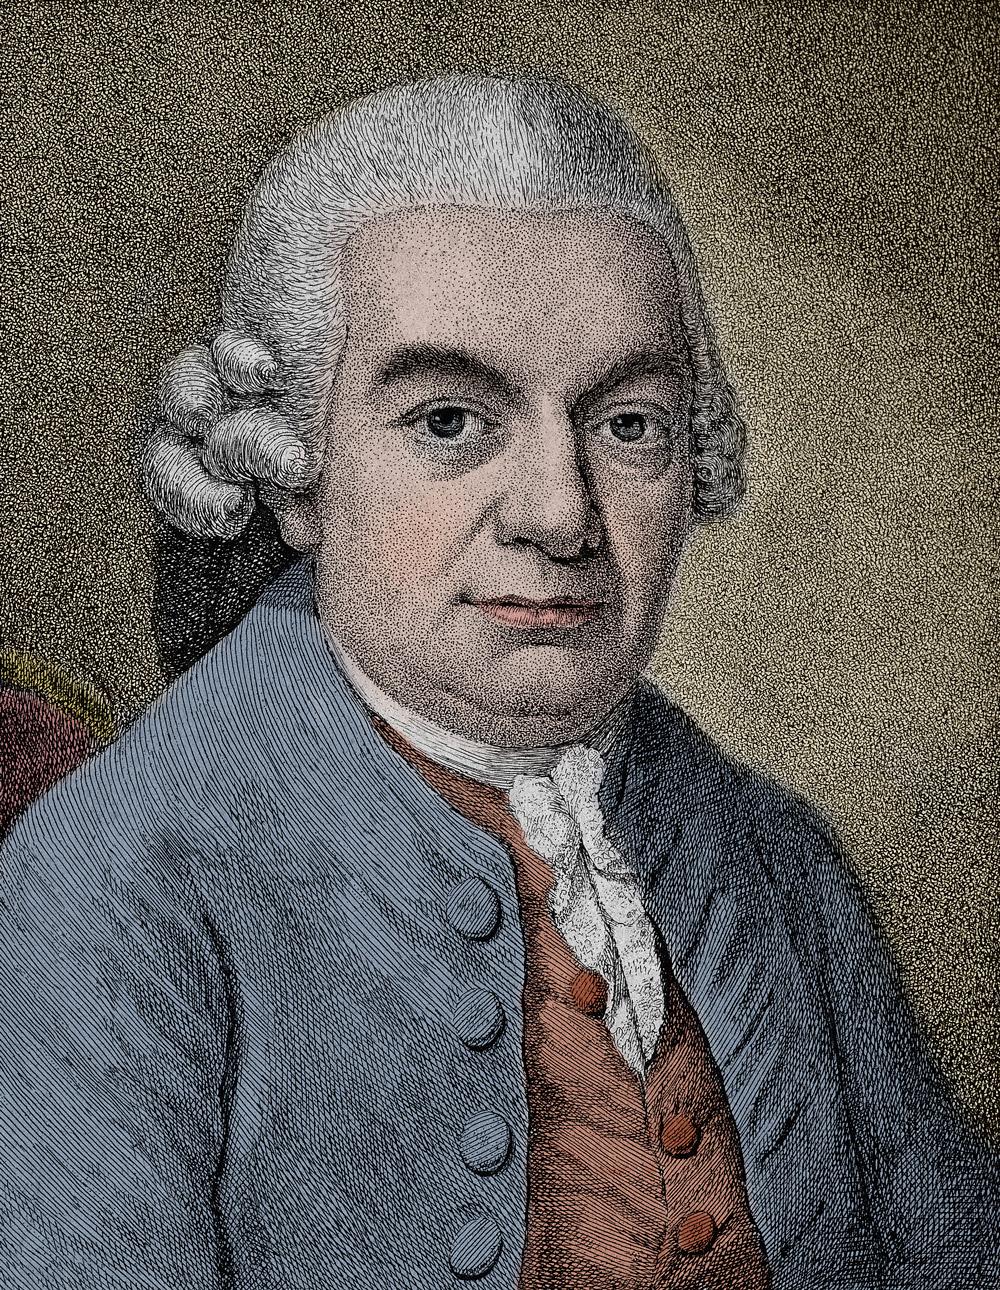 5th Child - Carl Philipp Emanuel Bach